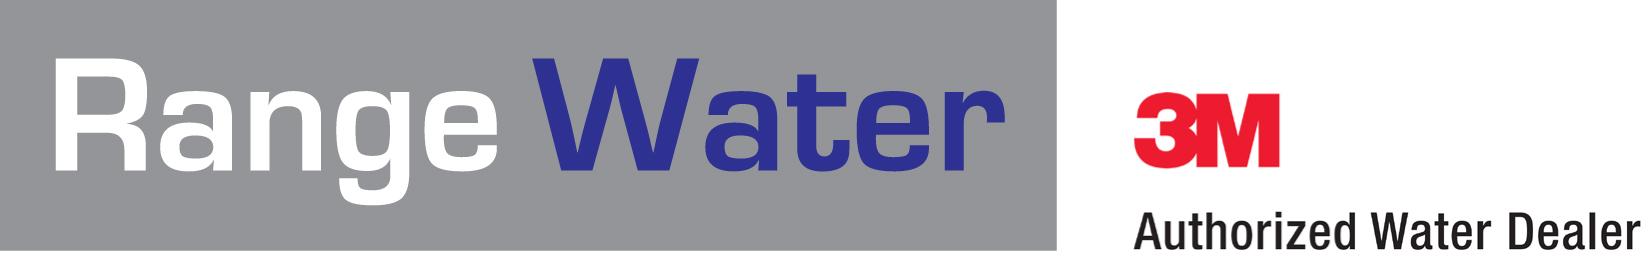 Range Water